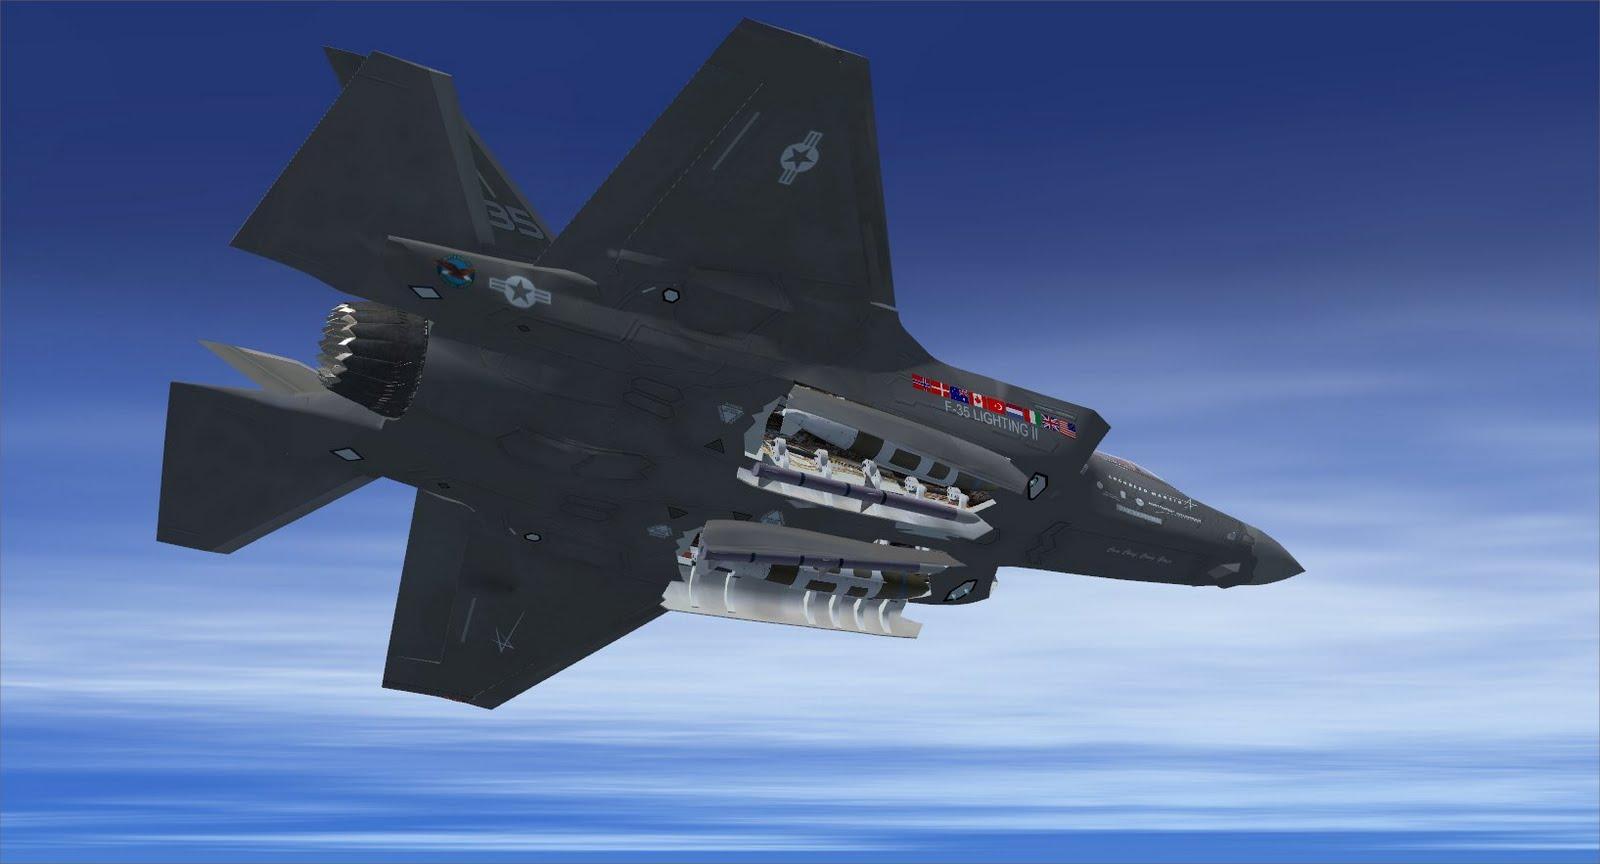 t50/pak fa  ليست شبحيه حتى الان بالتحليل والصور والمصادر  F35Nov5